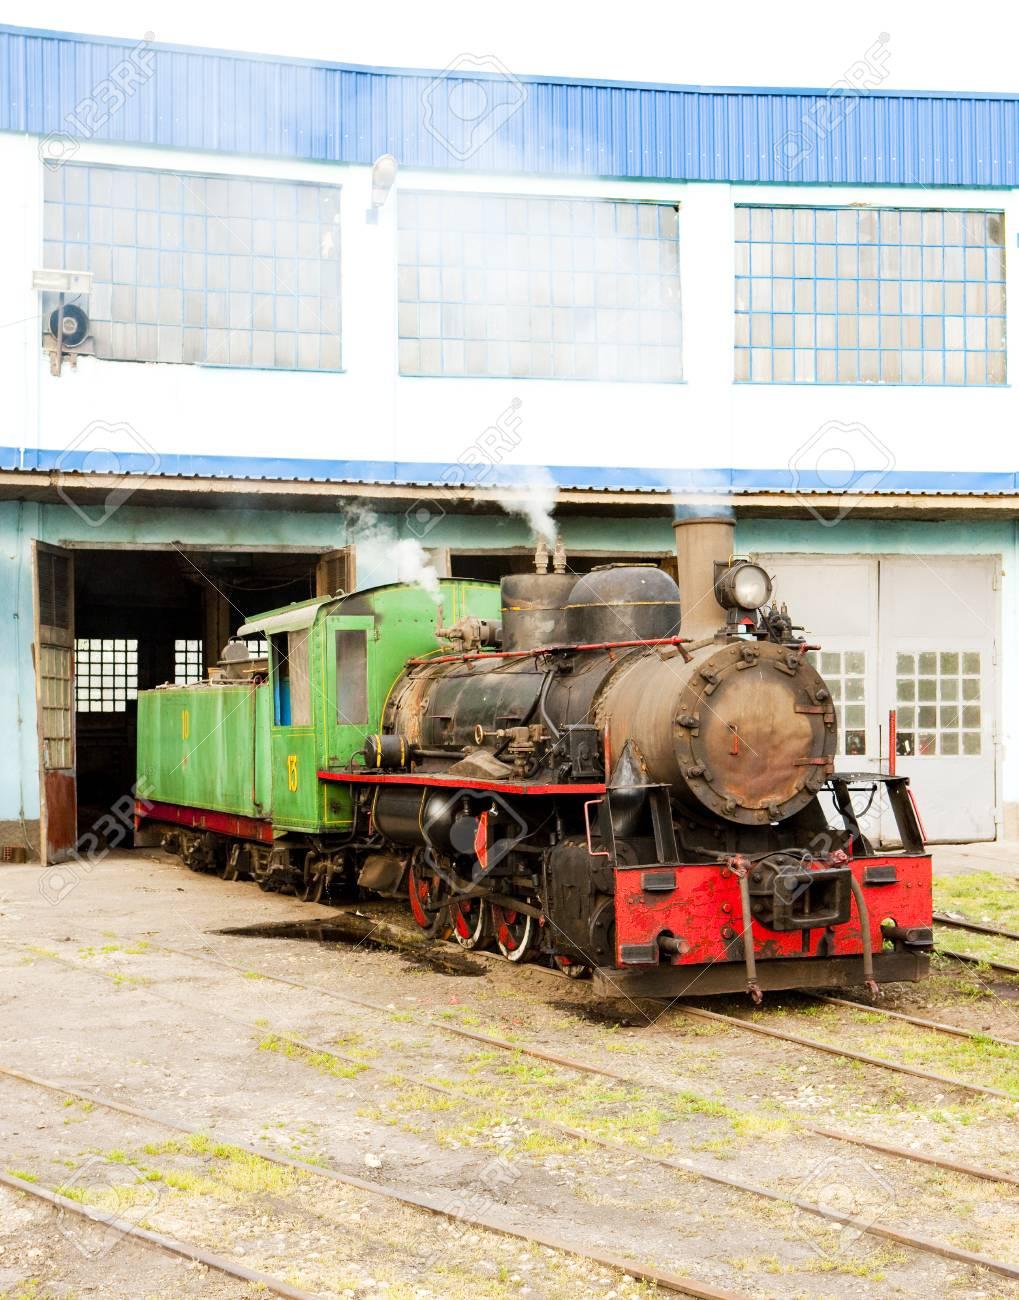 steam locomotive in depot, Kostolac, Serbia Stock Photo - 26217522